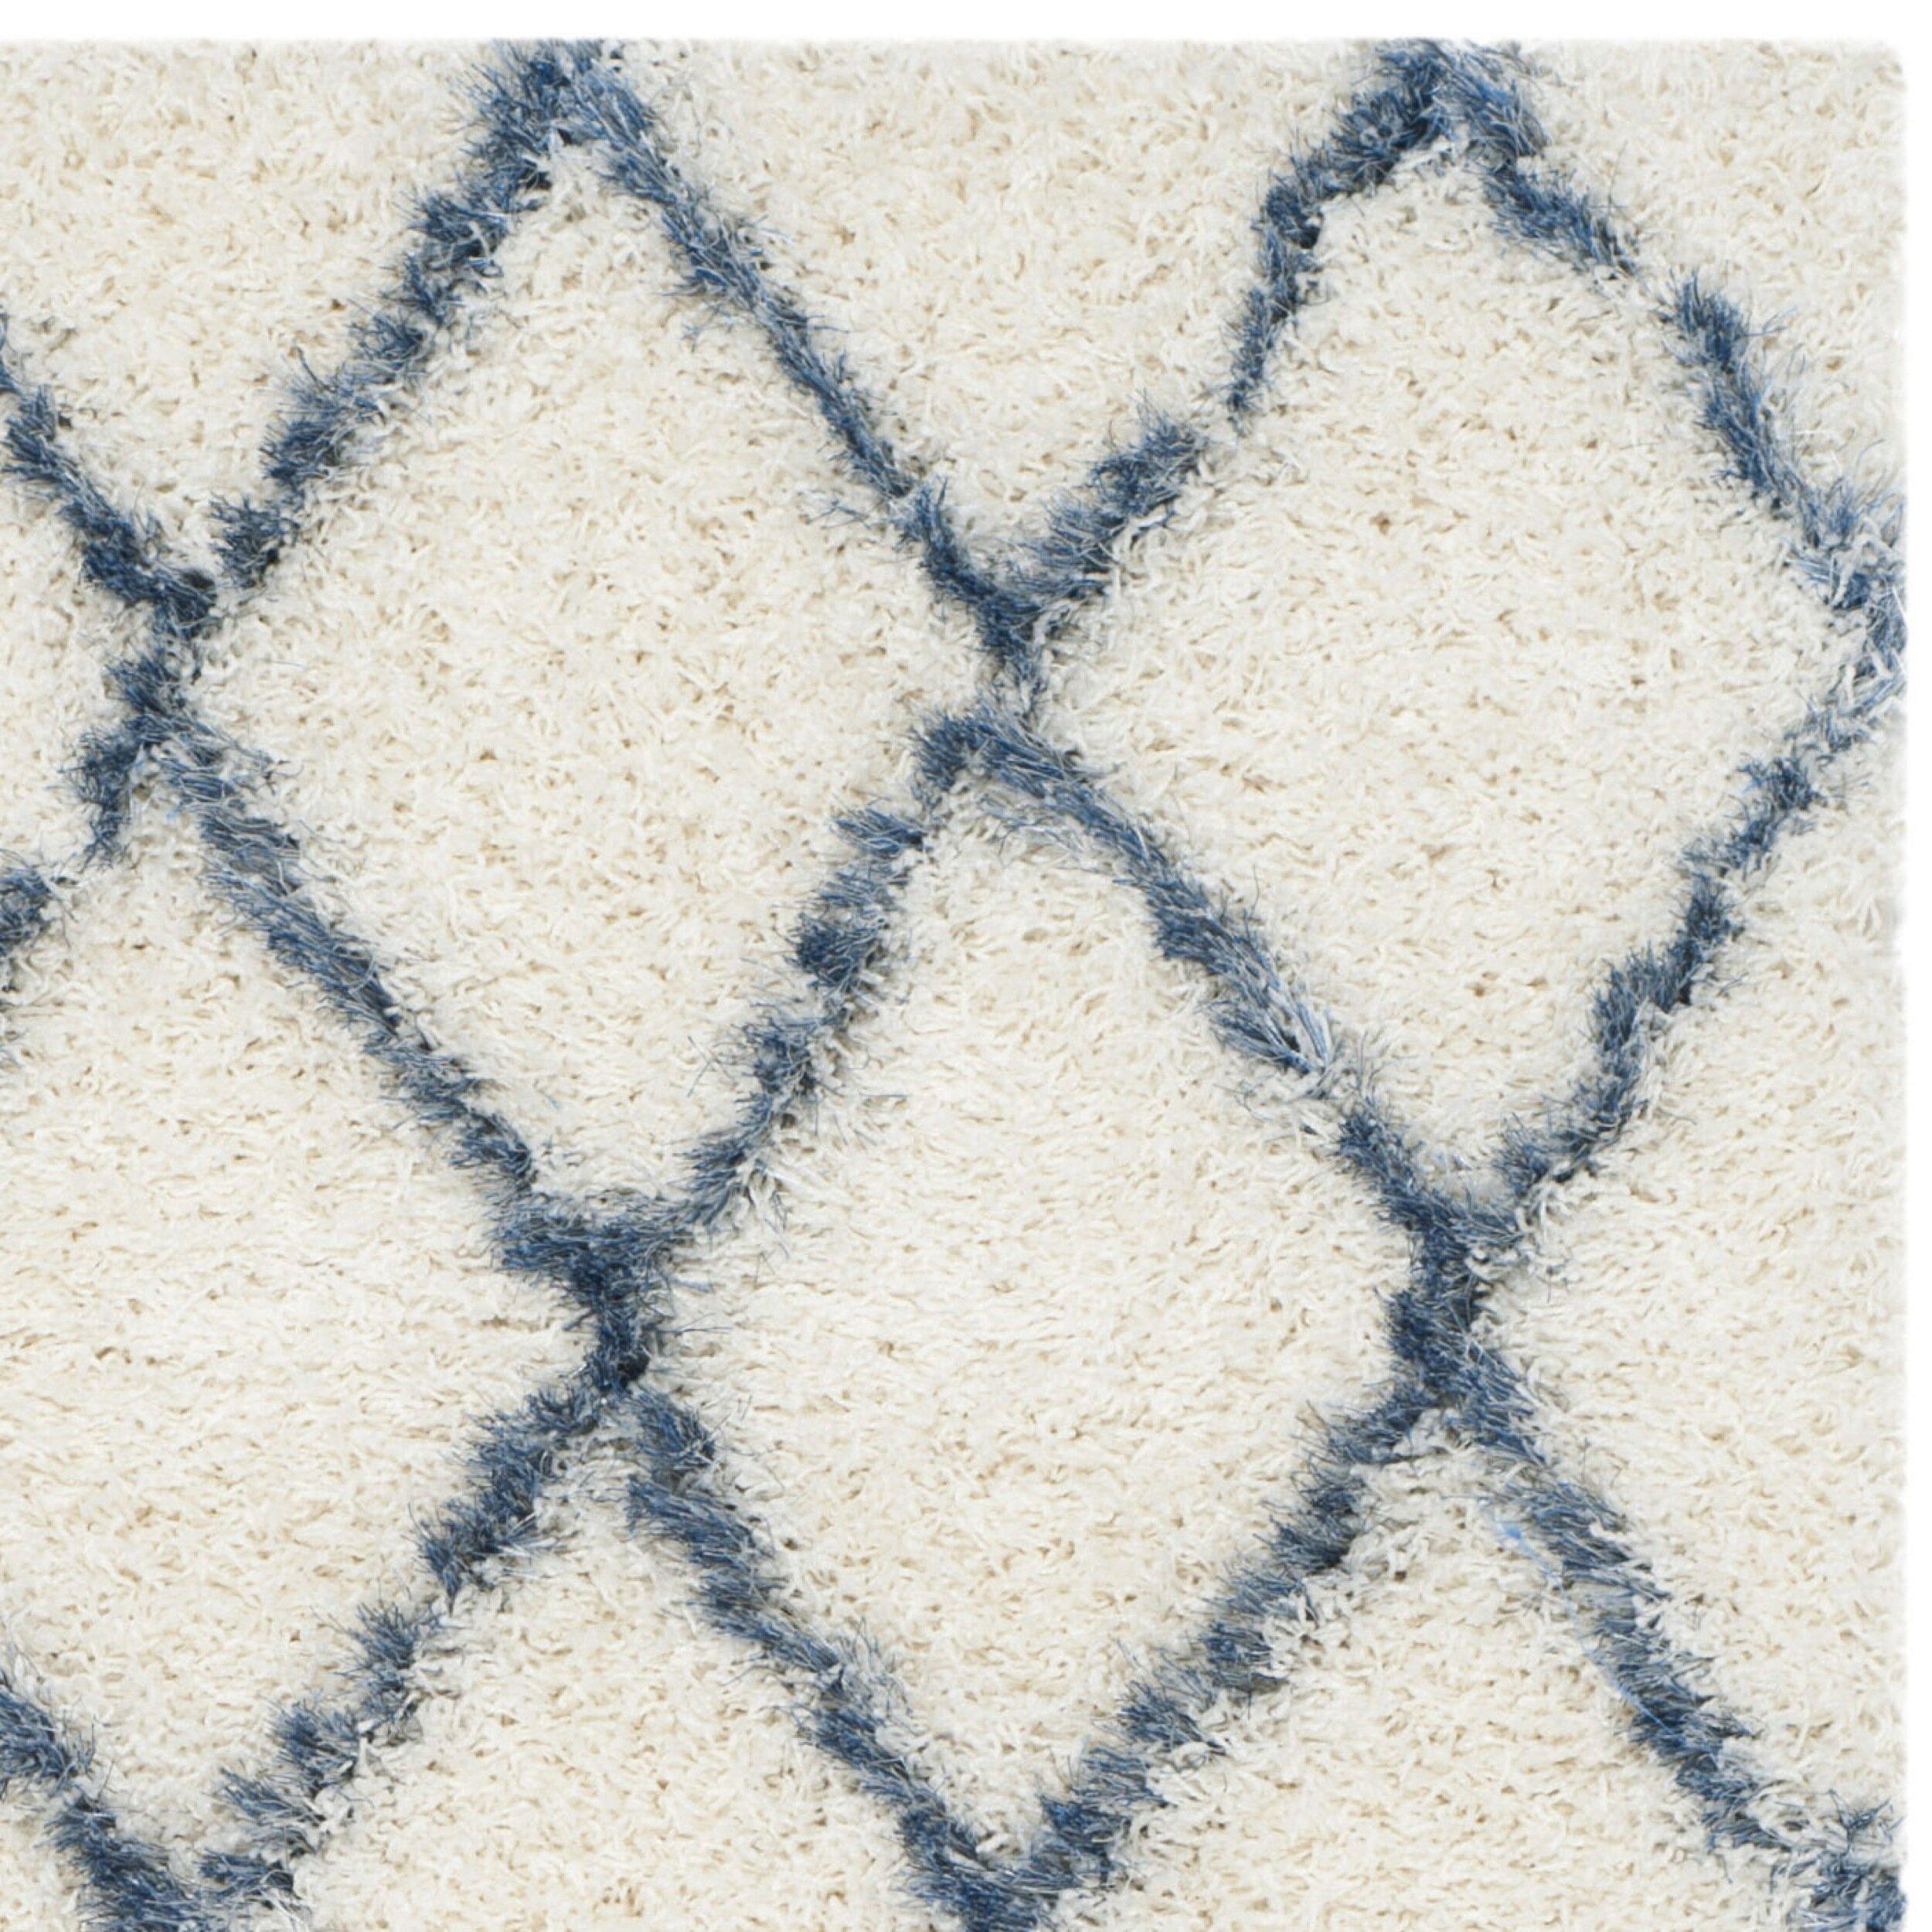 ^ Brayden Studio rmstead Ivory & Blue Geometric ontemporary rea ...